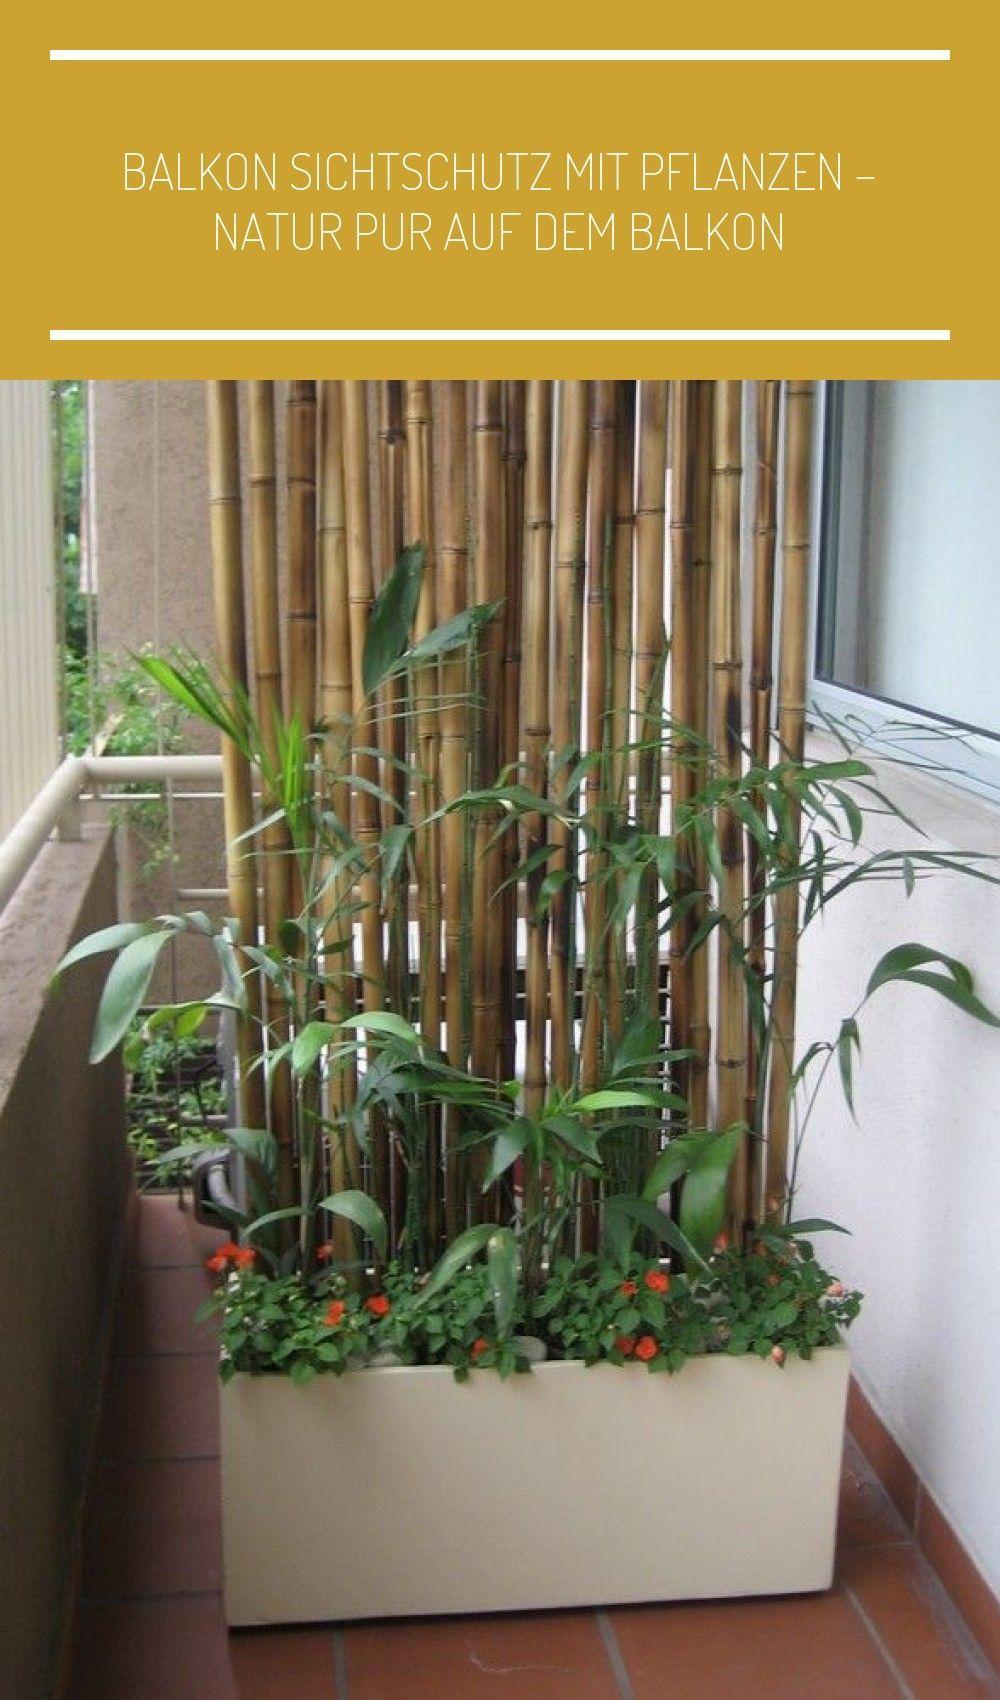 Balkon Sichtschutz Pflanzen Pflanzkuebel Bambusstangen Wand